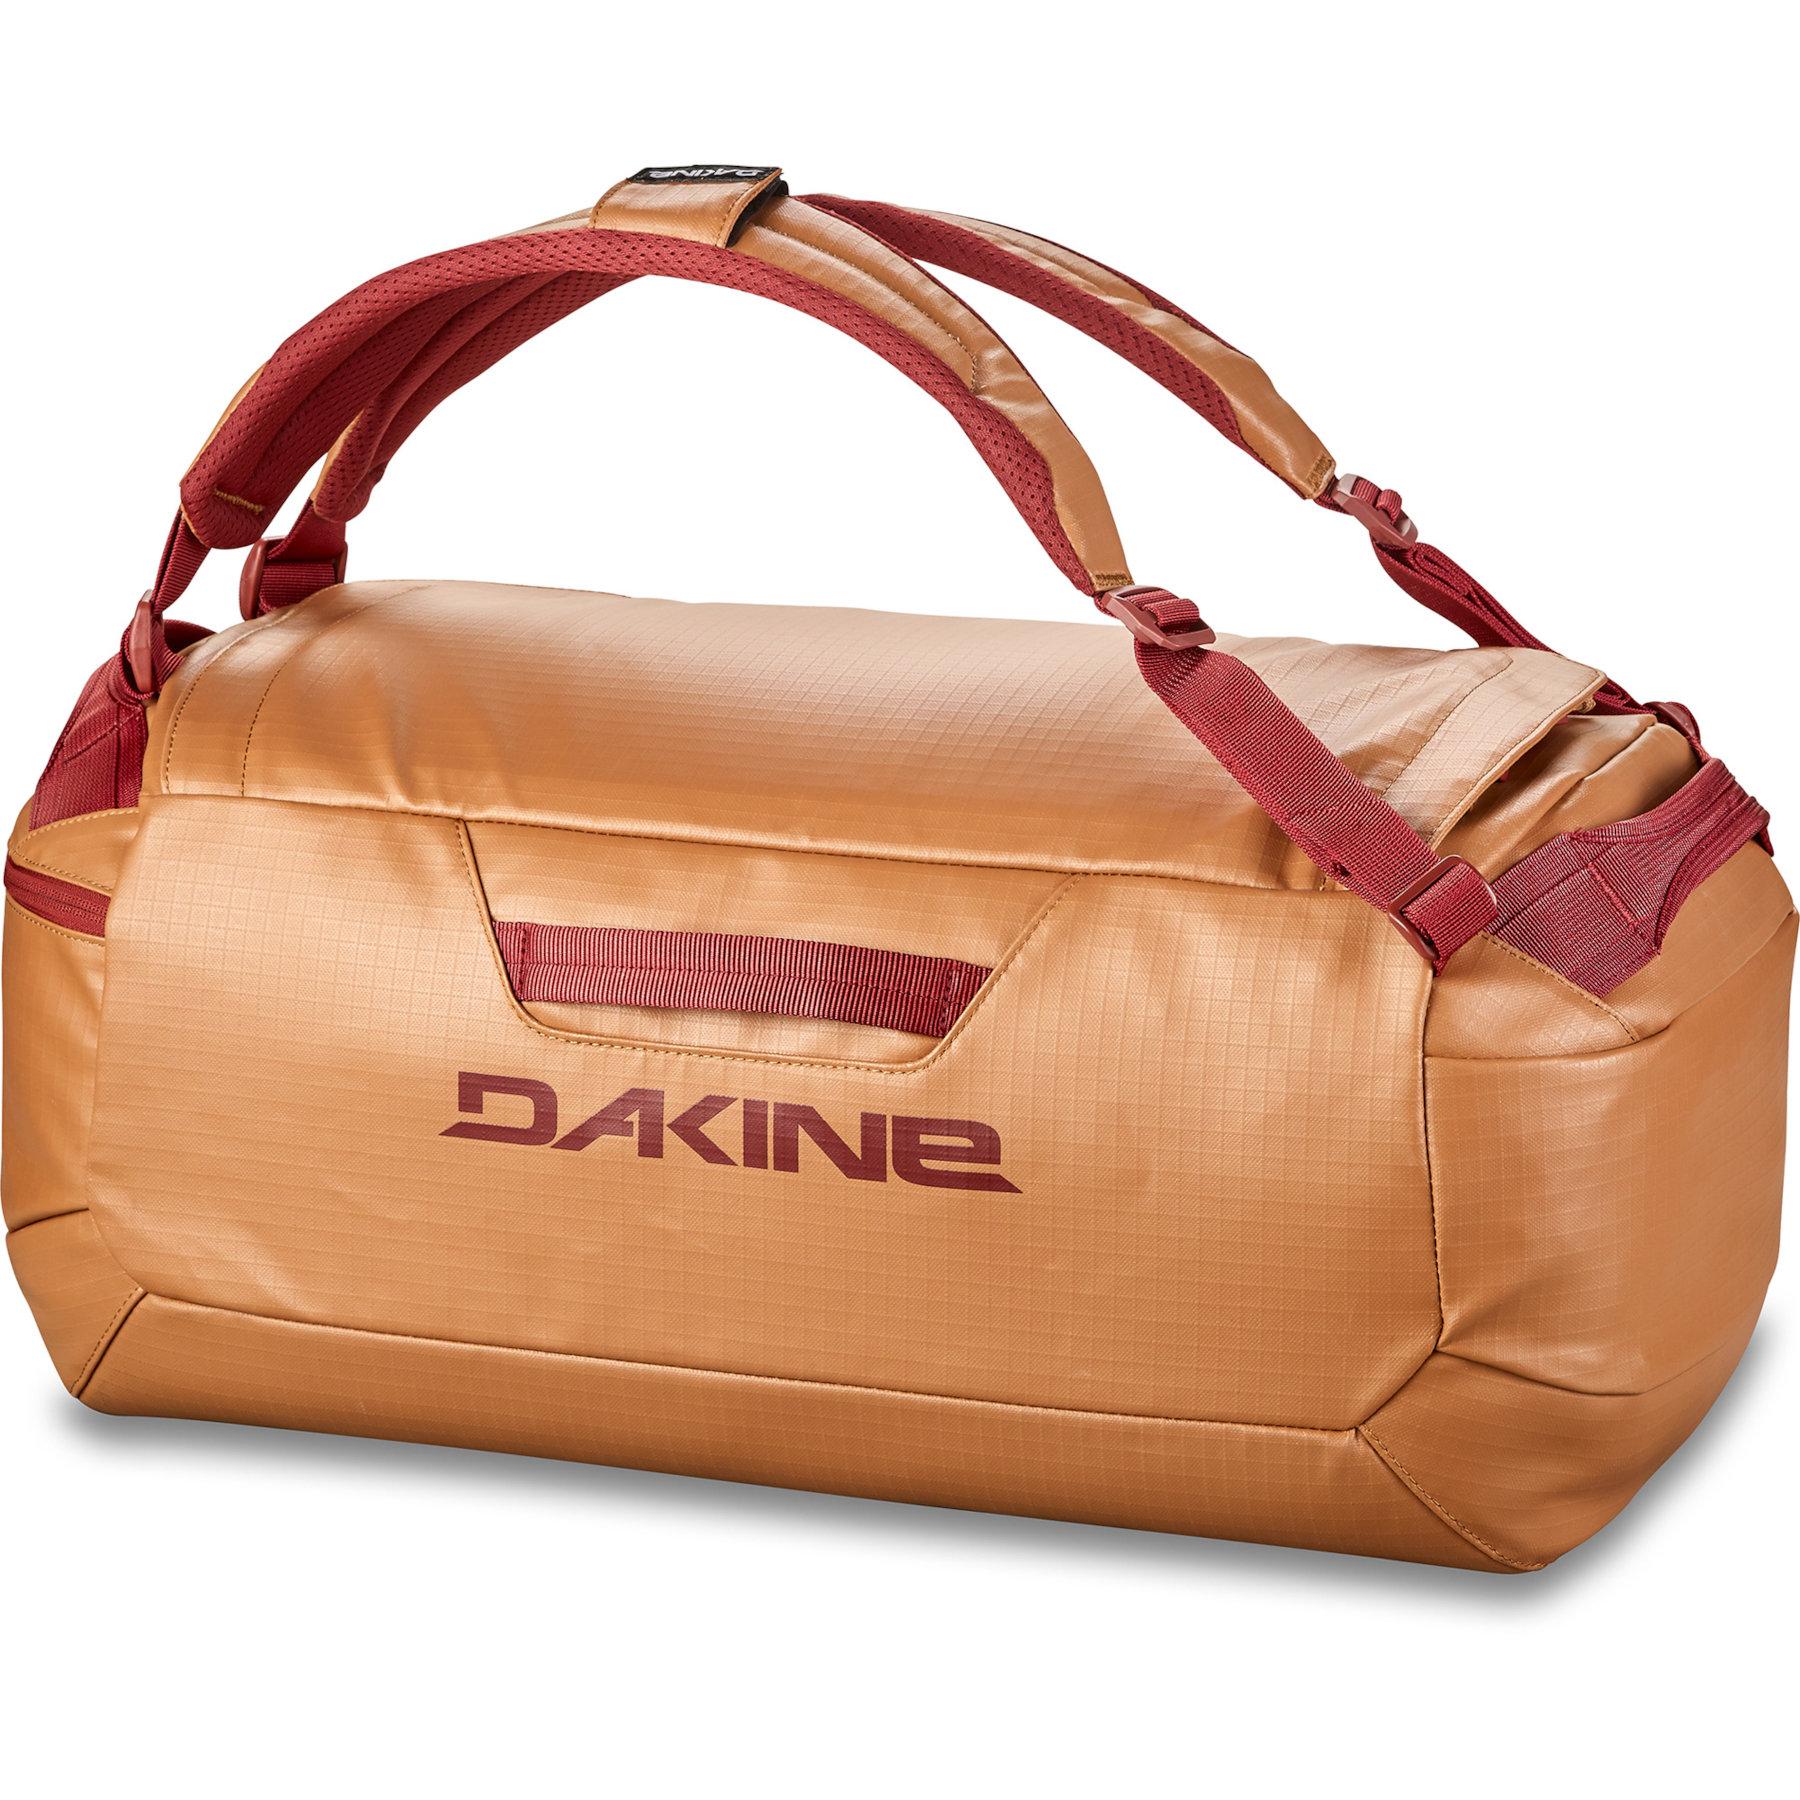 Image of Dakine Ranger Duffle 45L - Caramel